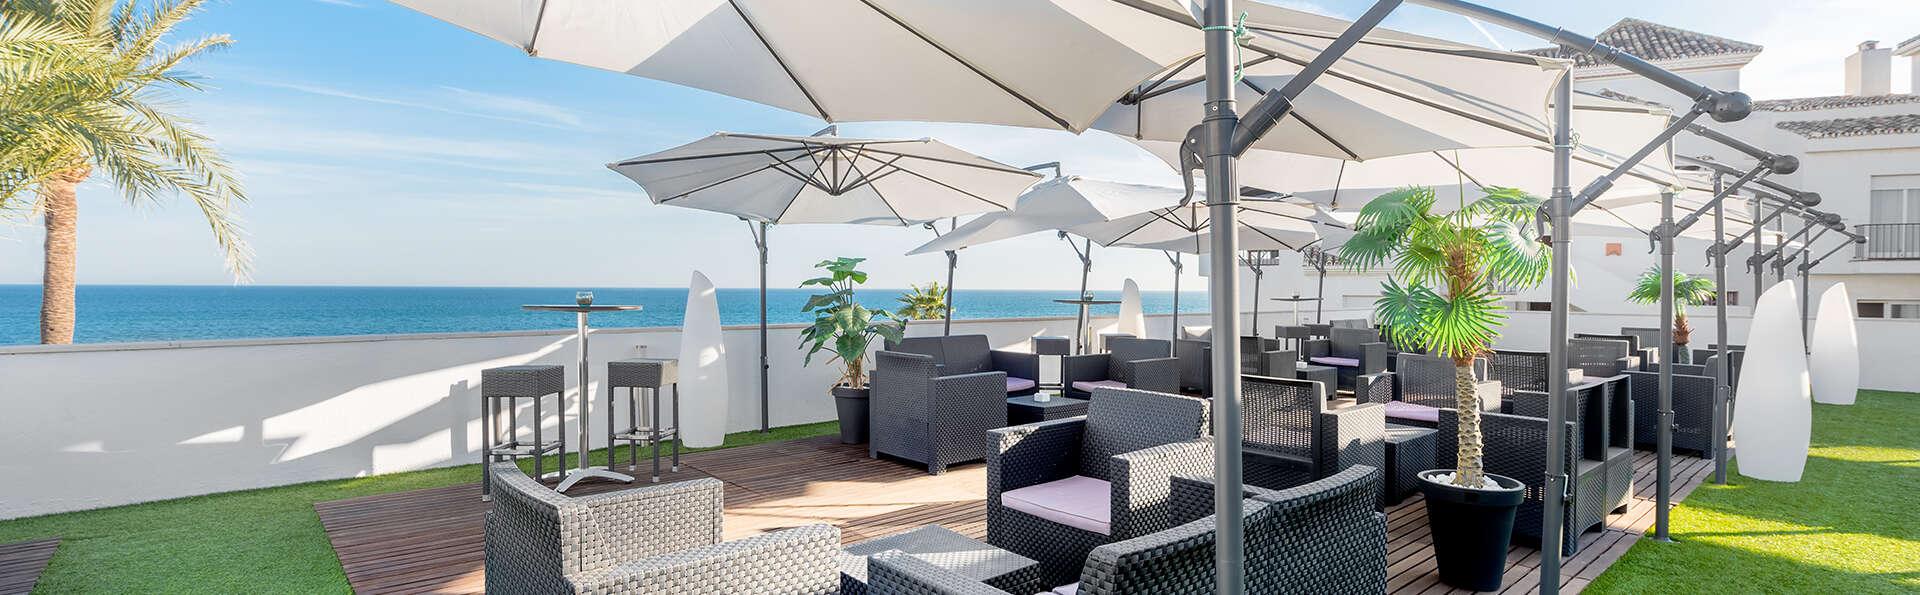 VIK Gran Hotel Costa Del Sol - EDIT_NEW_Terrace4.jpg